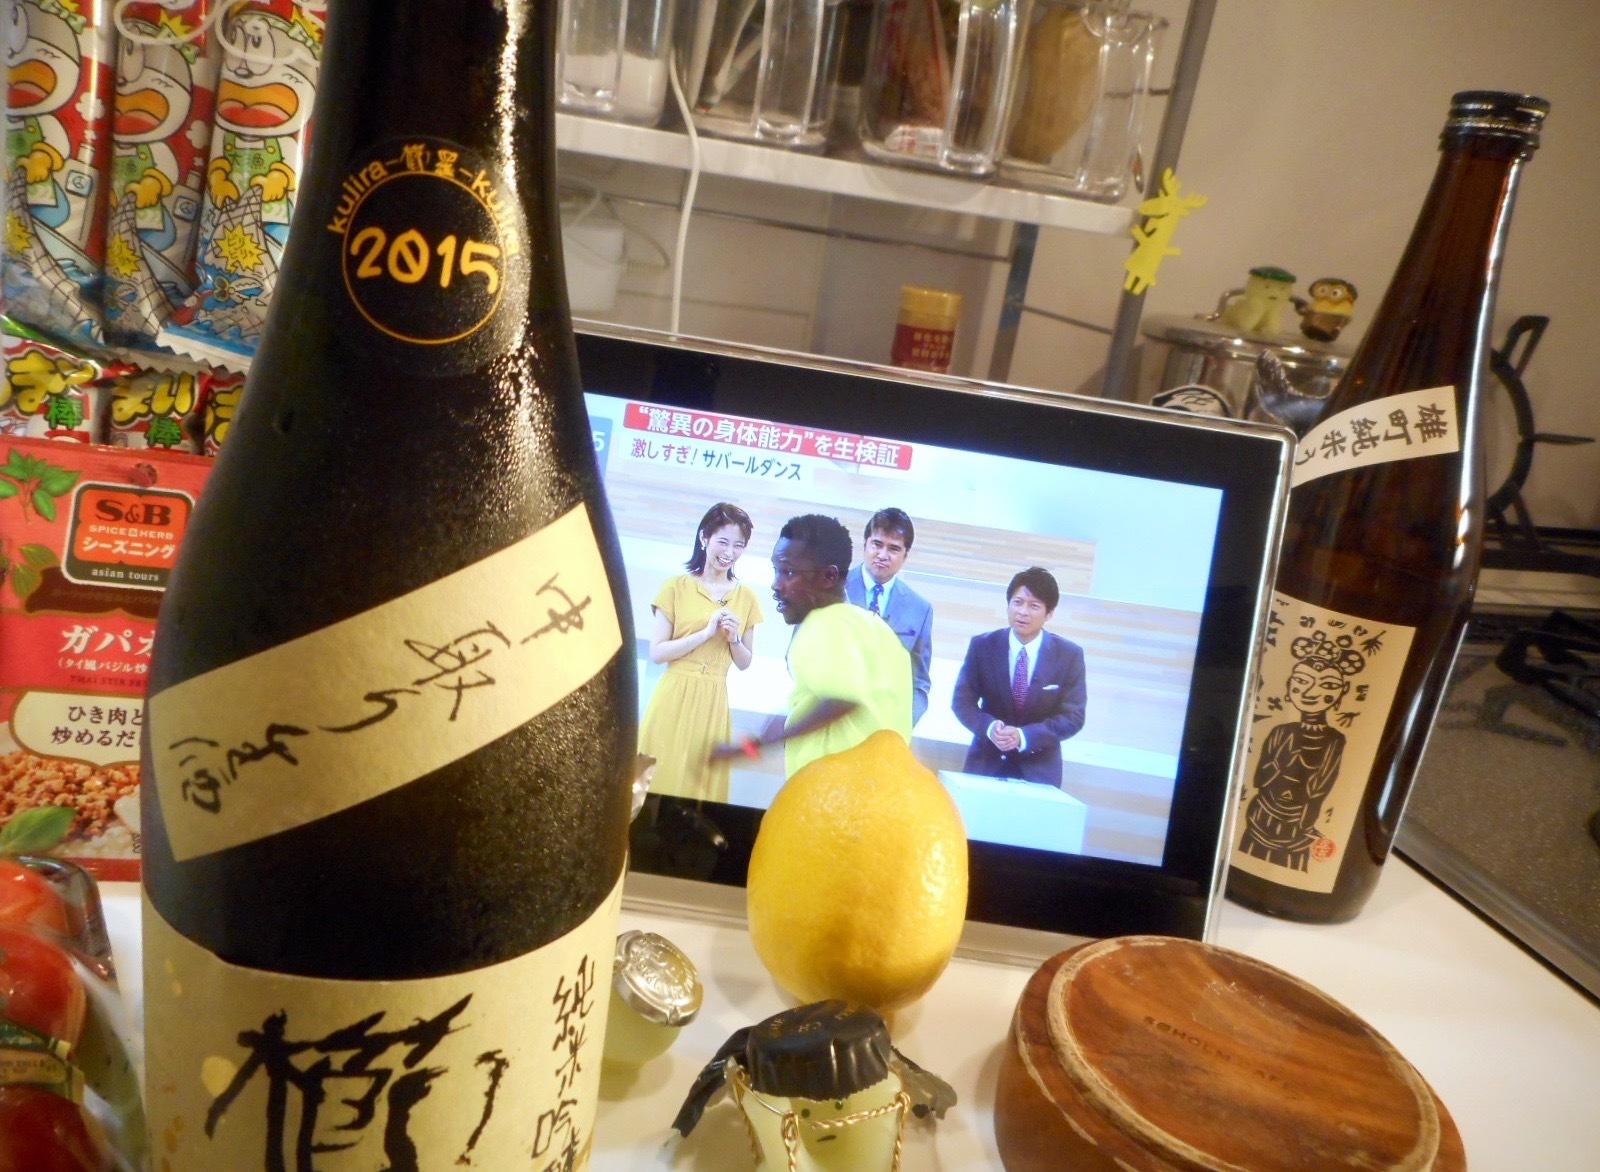 kujira2015_2_3.jpg